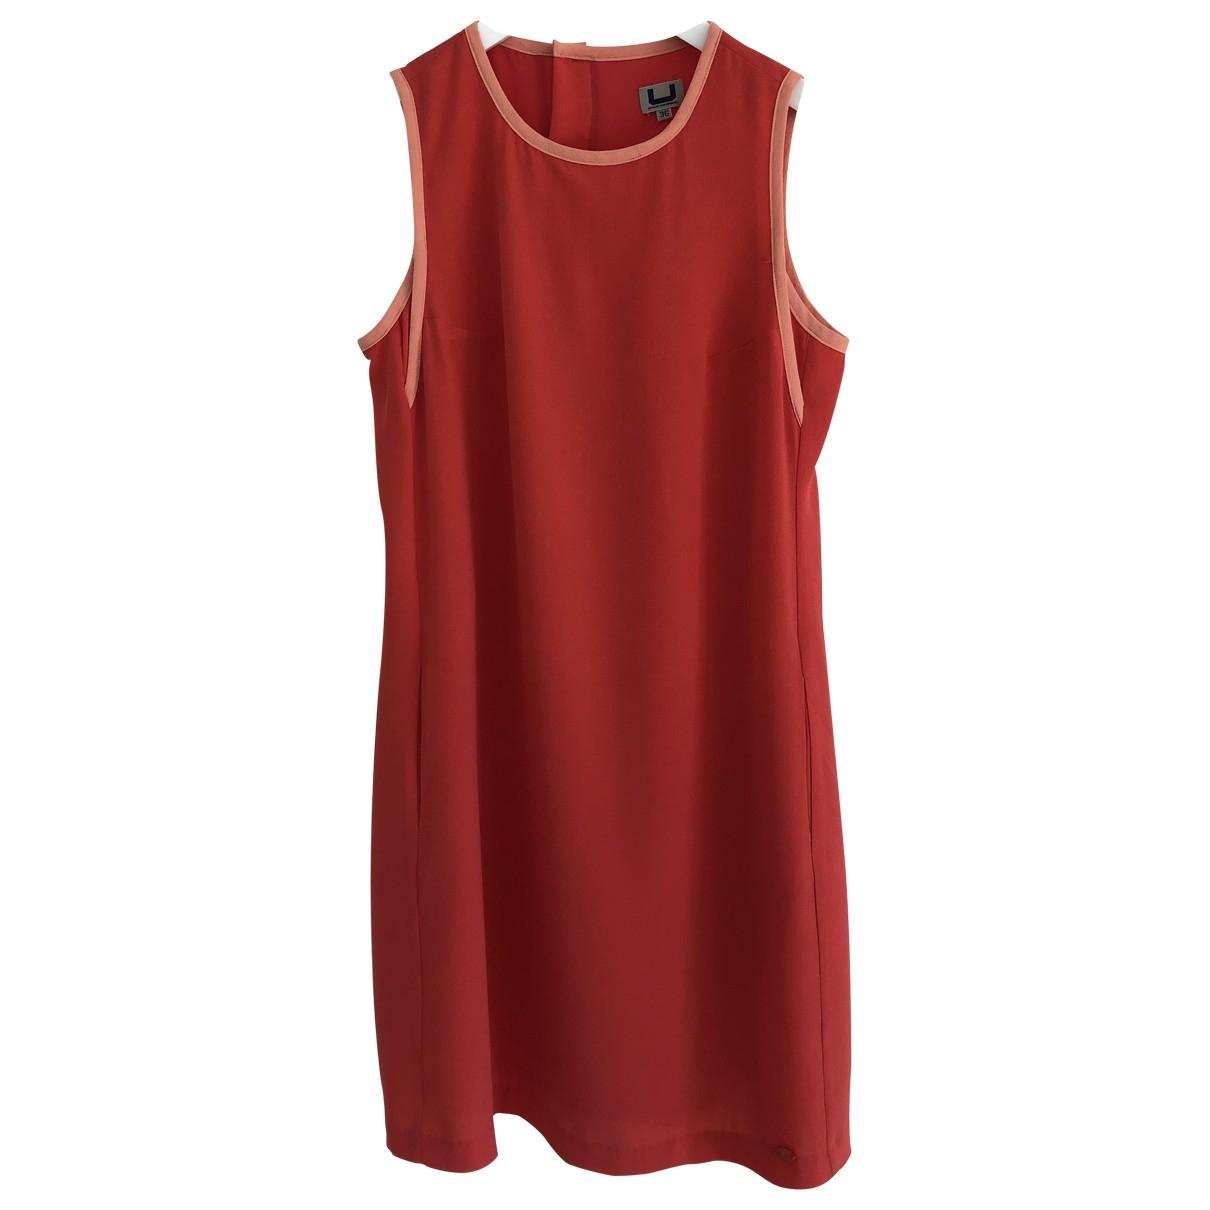 Adolfo Dominguez \N Kleid in  Rosa Polyester